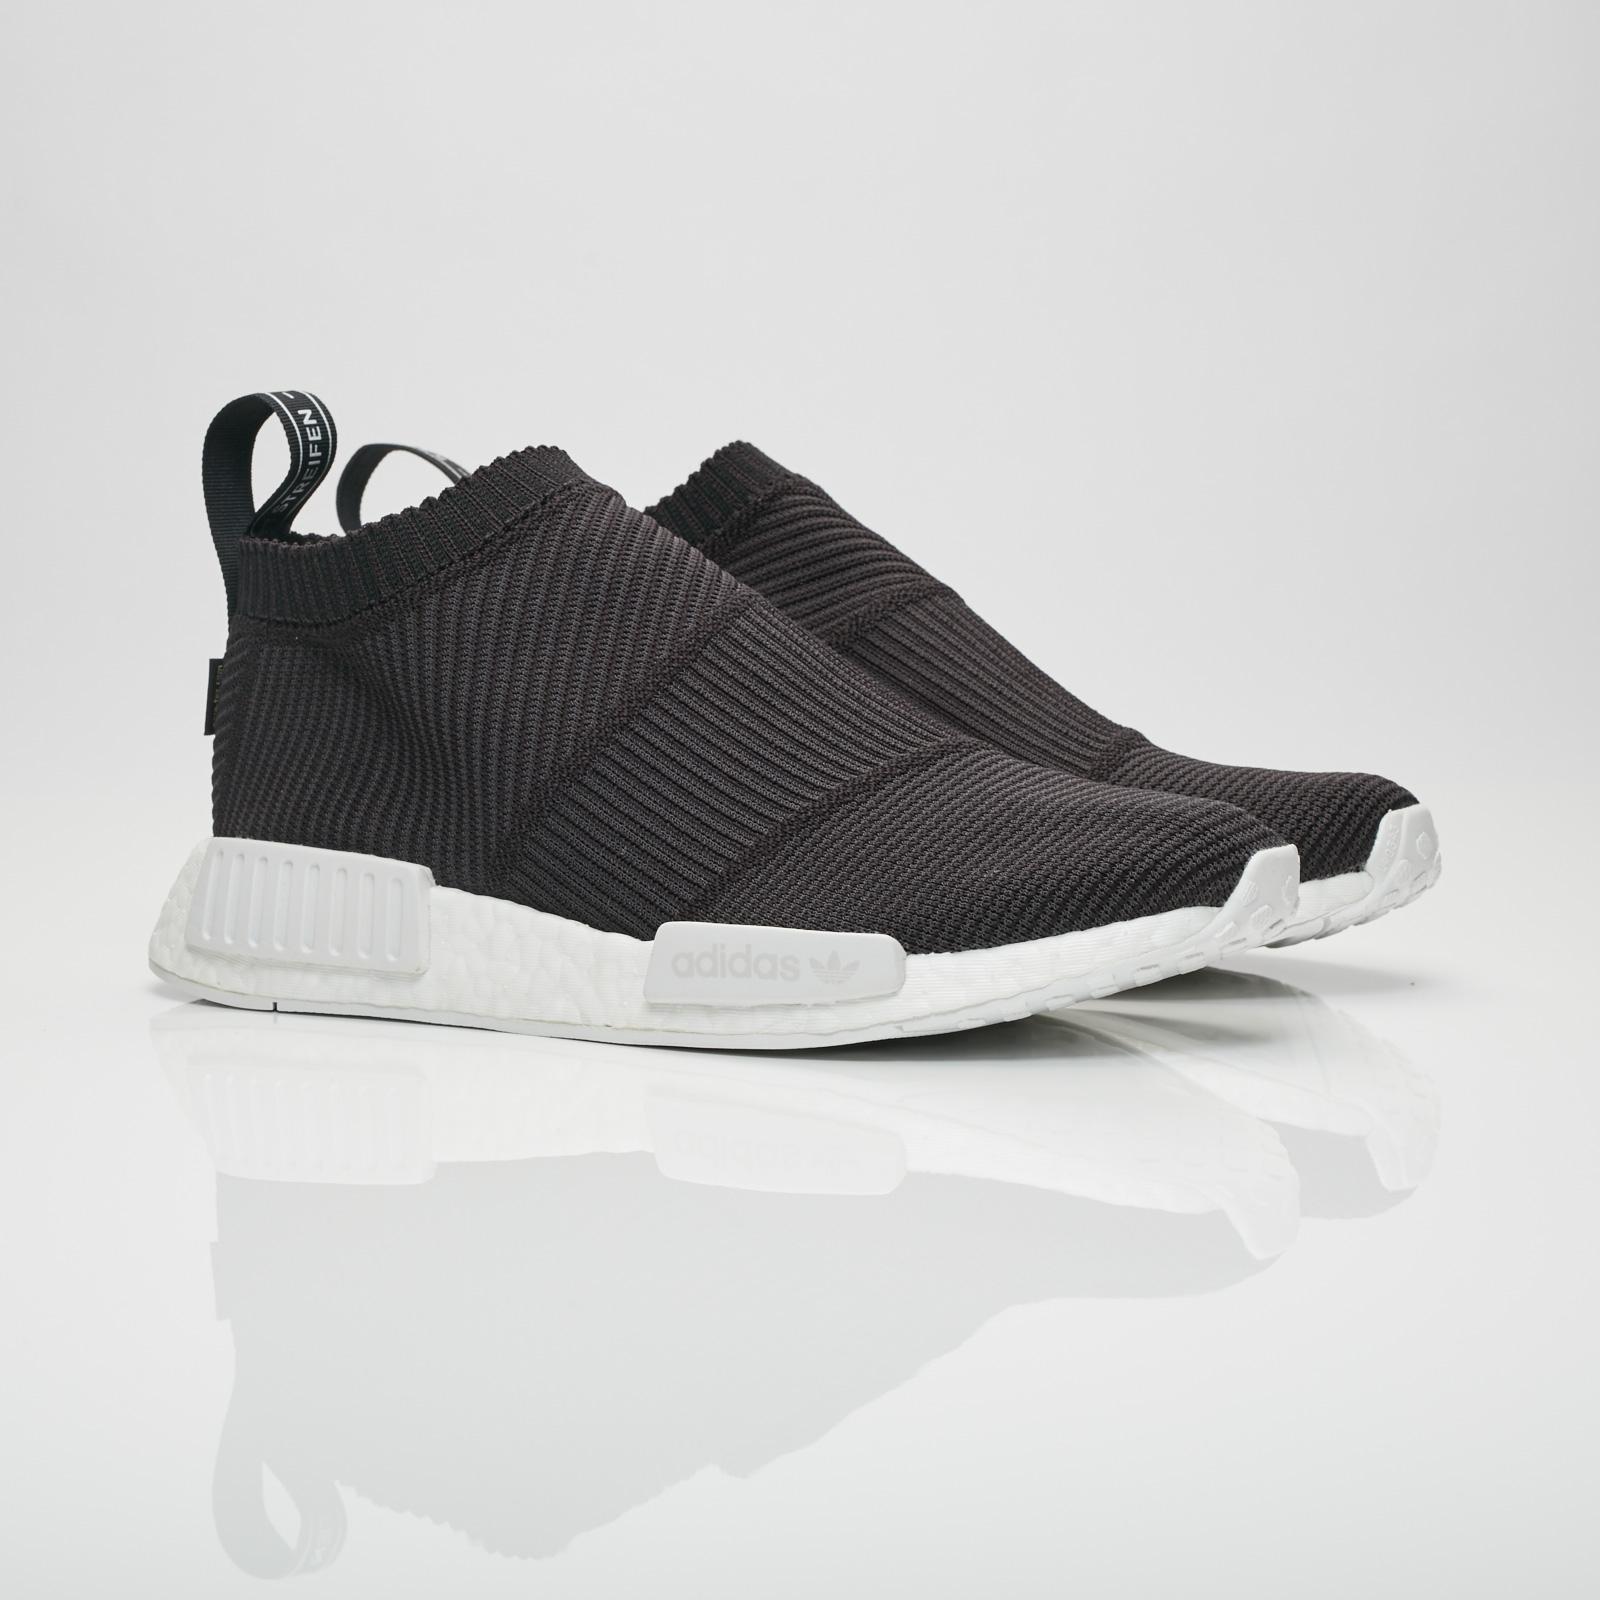 aba4bf2edb0 adidas NMD Gore-tex Primeknit - By9405 - Sneakersnstuff